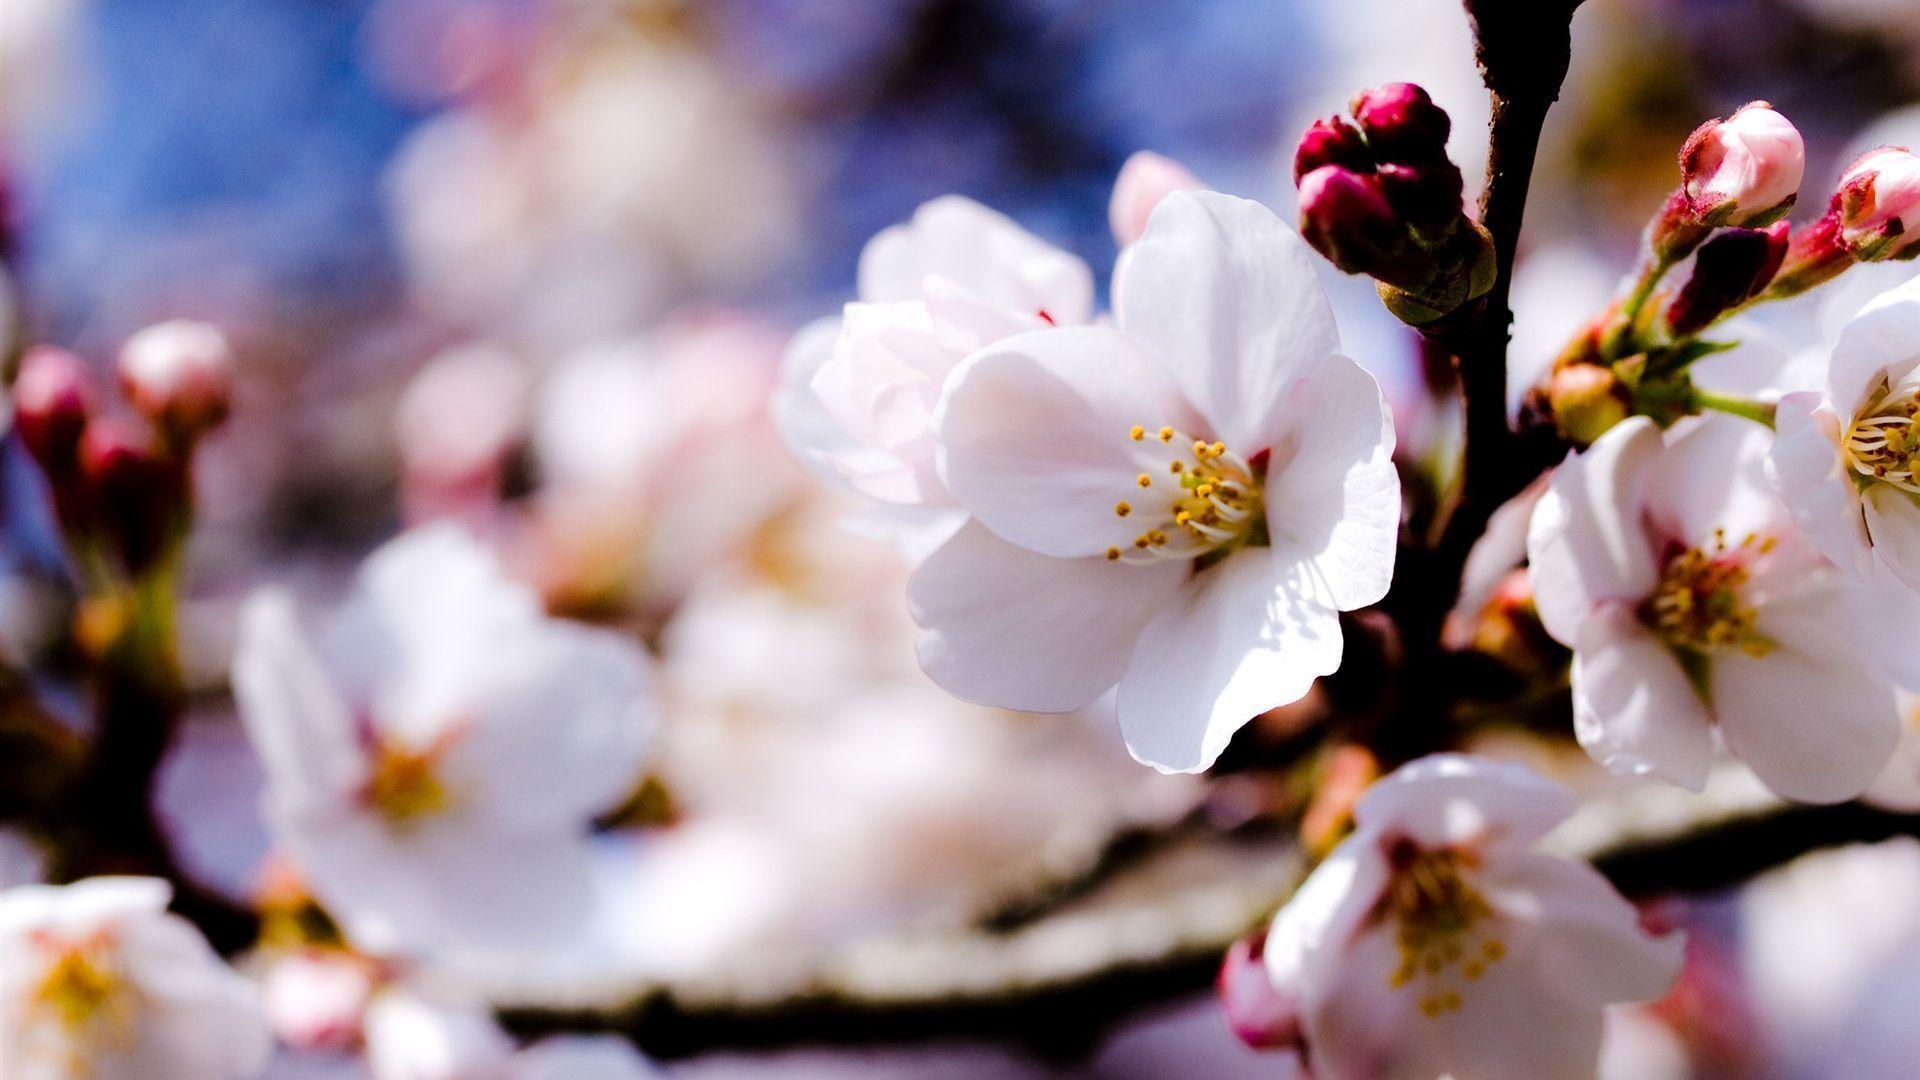 flowers spring wallpaper 1920x1080 - photo #1